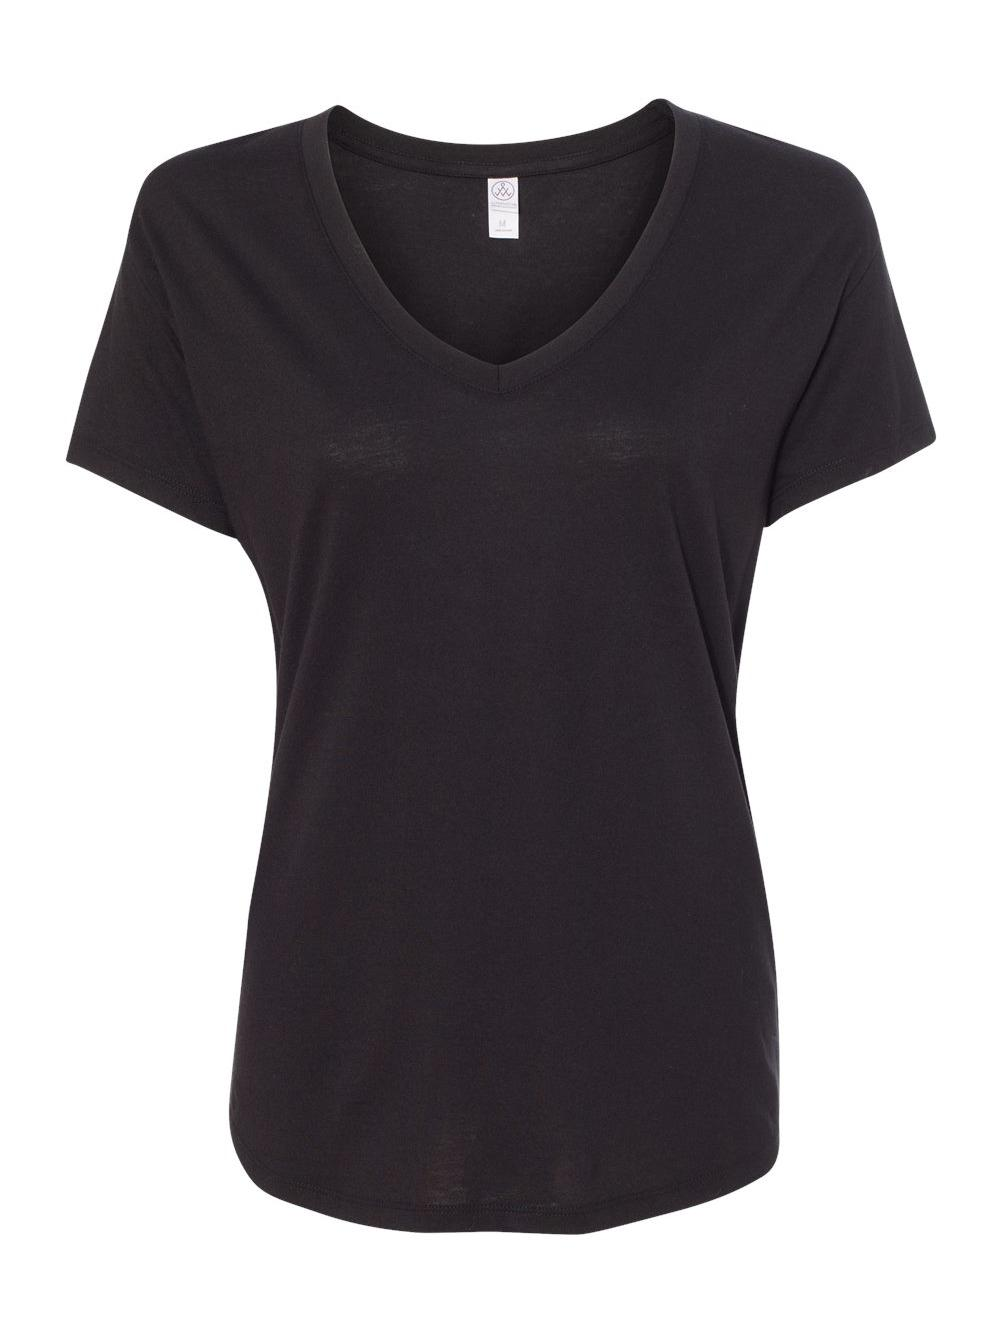 5e37ddd4a03f Alternative 02840mr Ladies' Everyday Cotton Modal V-neck Black M for ...